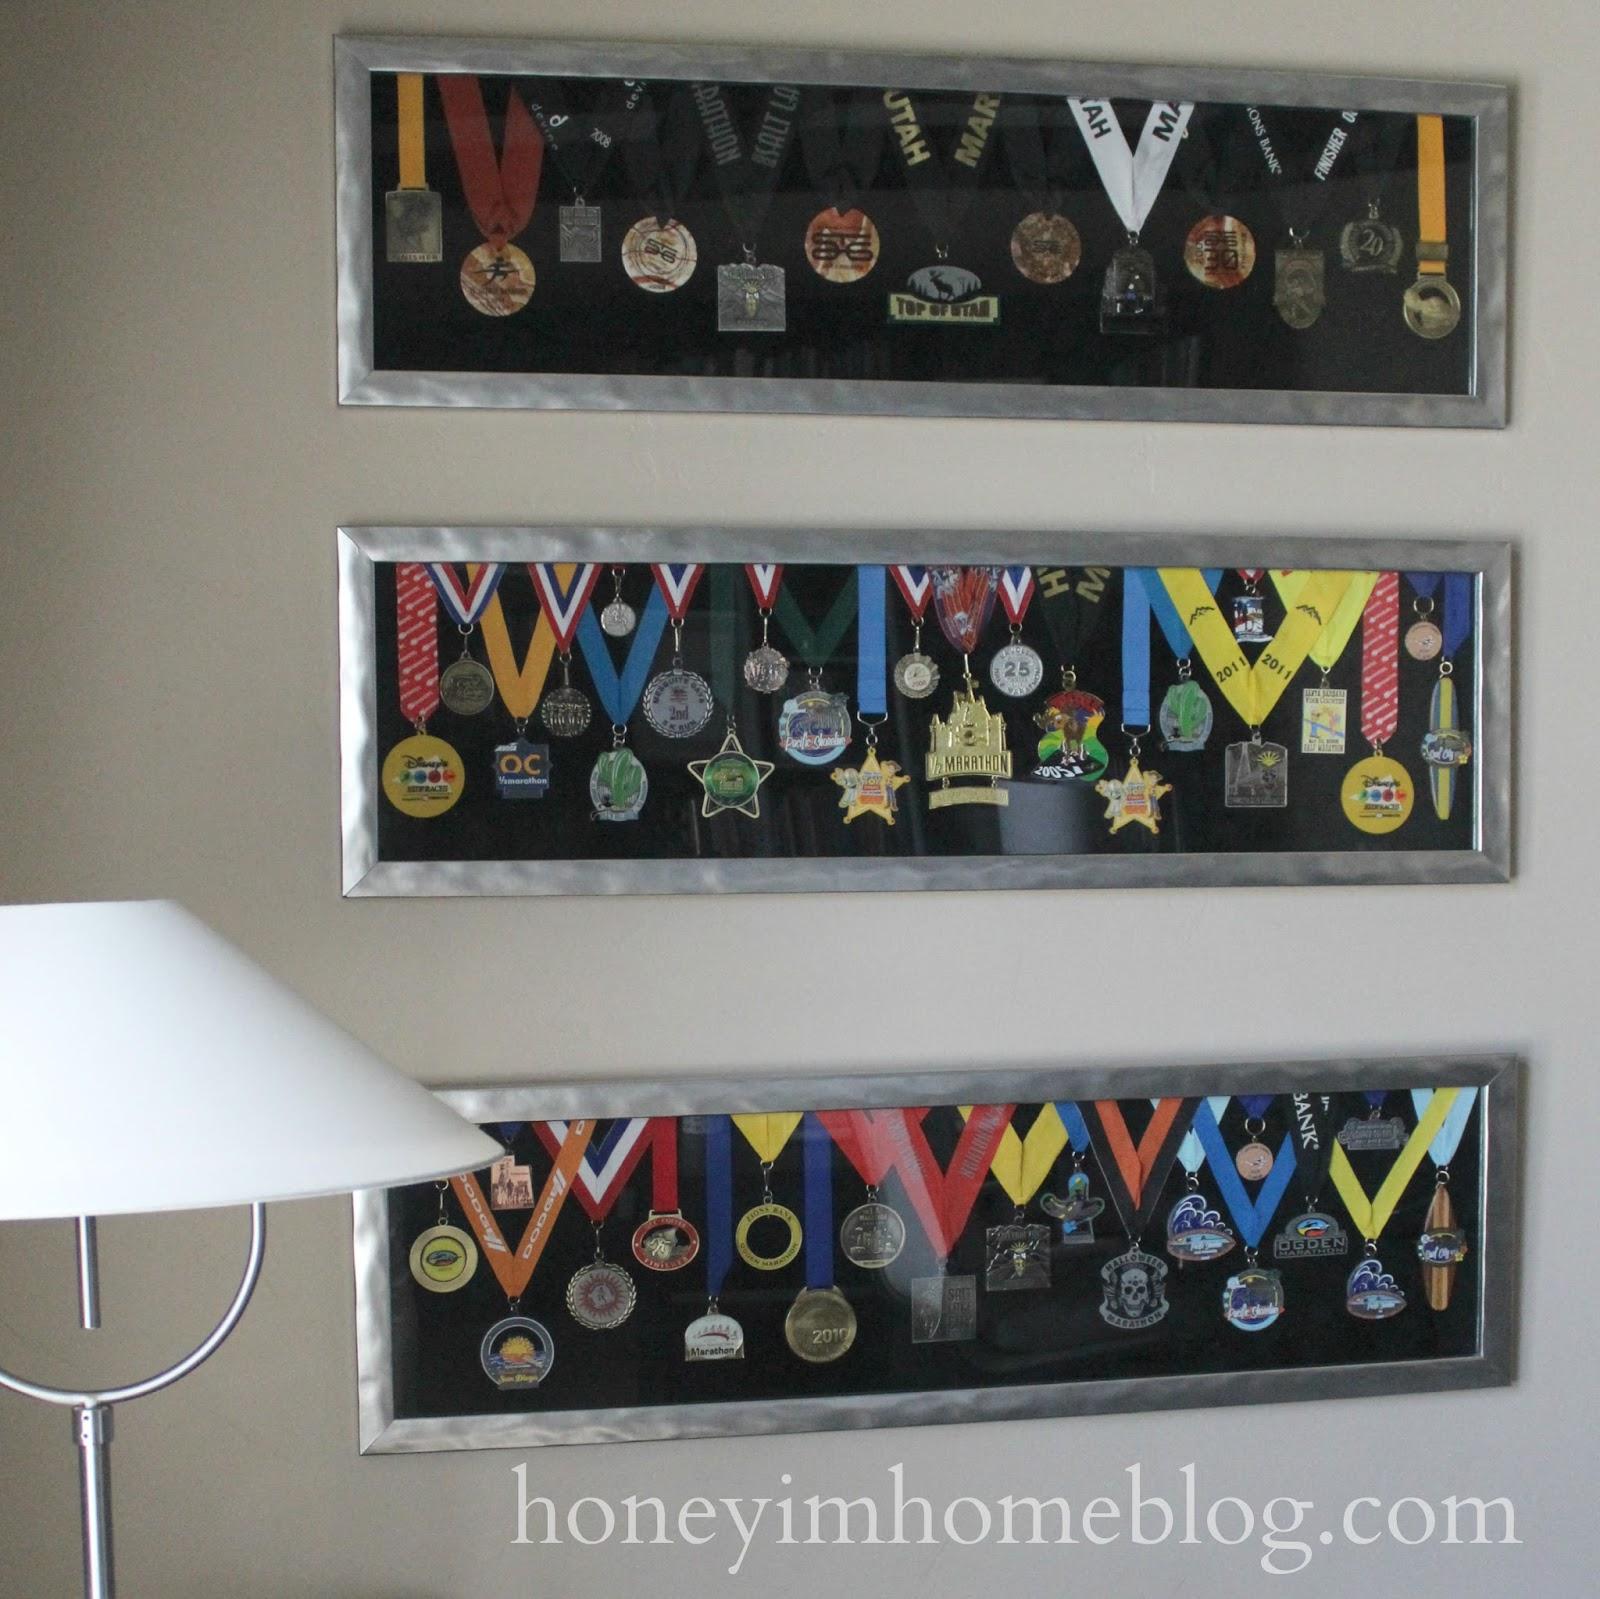 3 way displays porsche 996 seat wiring diagram honey i 39m home displaying running medals